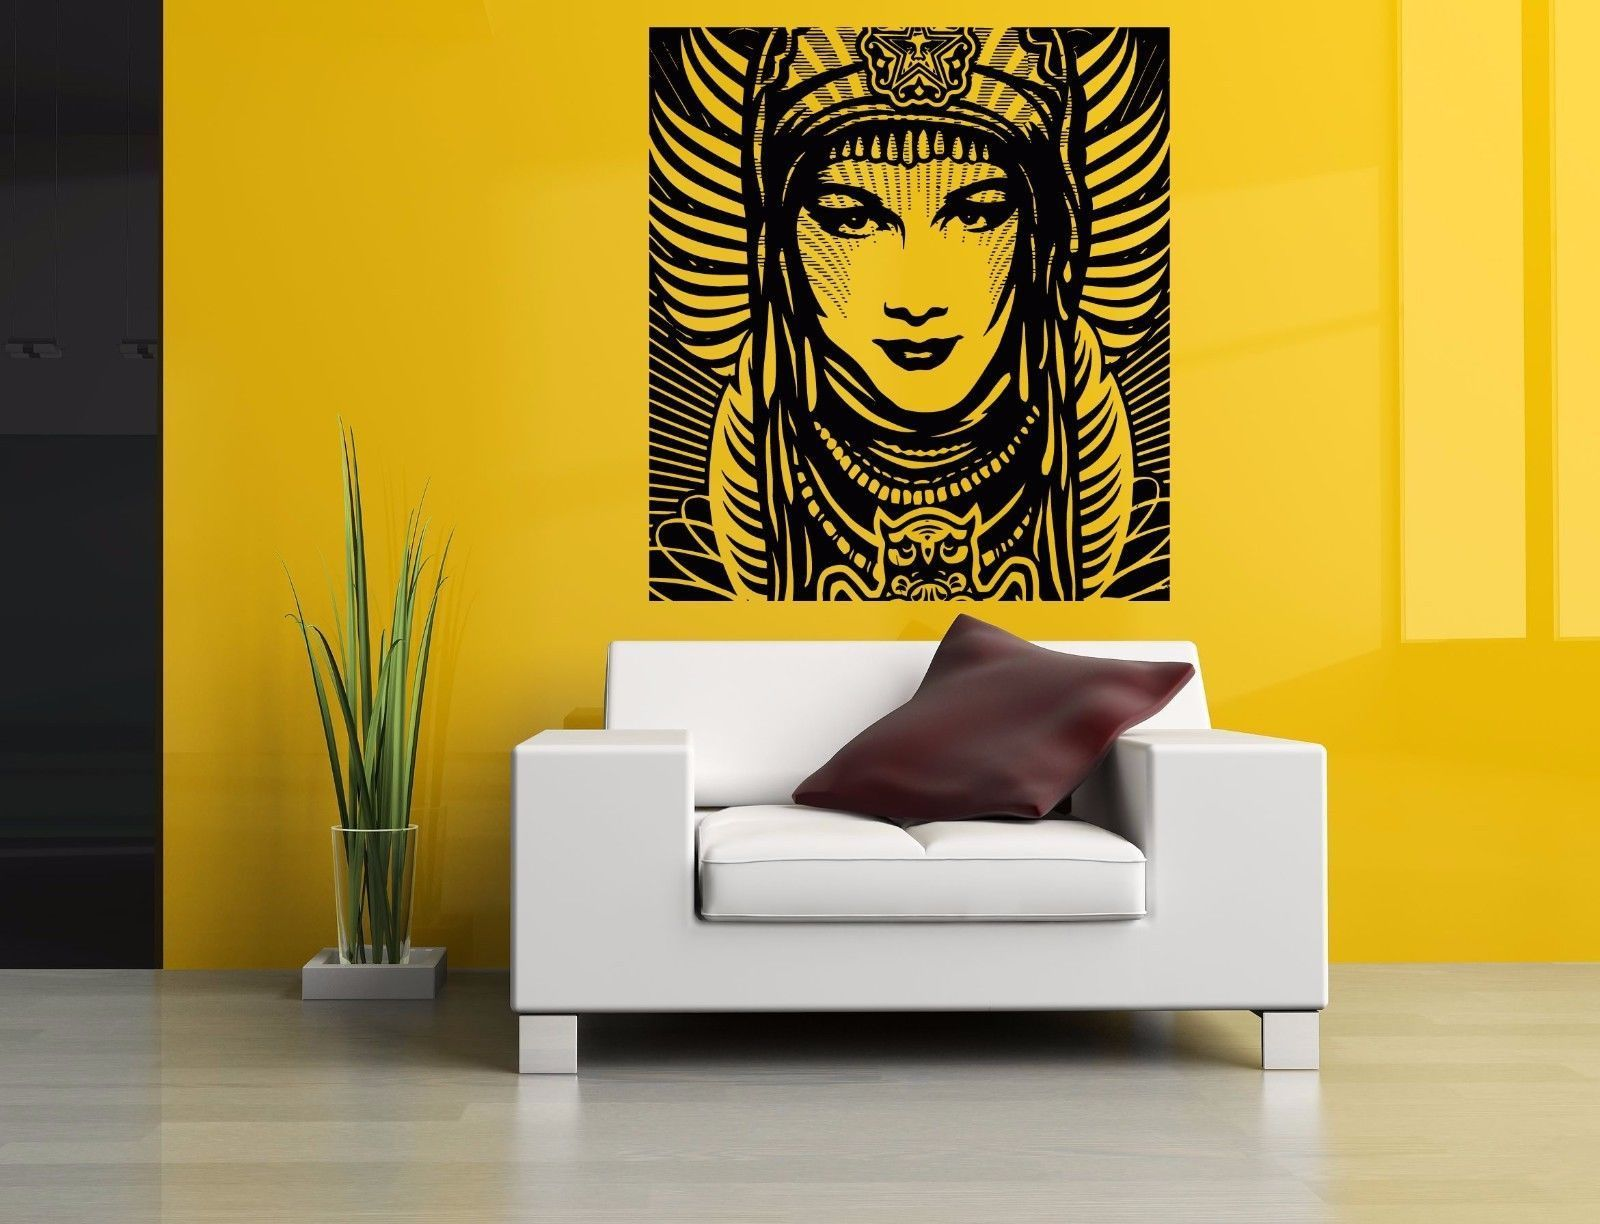 Wall Room Decor Art Vinyl Sticker Mural Decal Obey Girl Banner Big ...